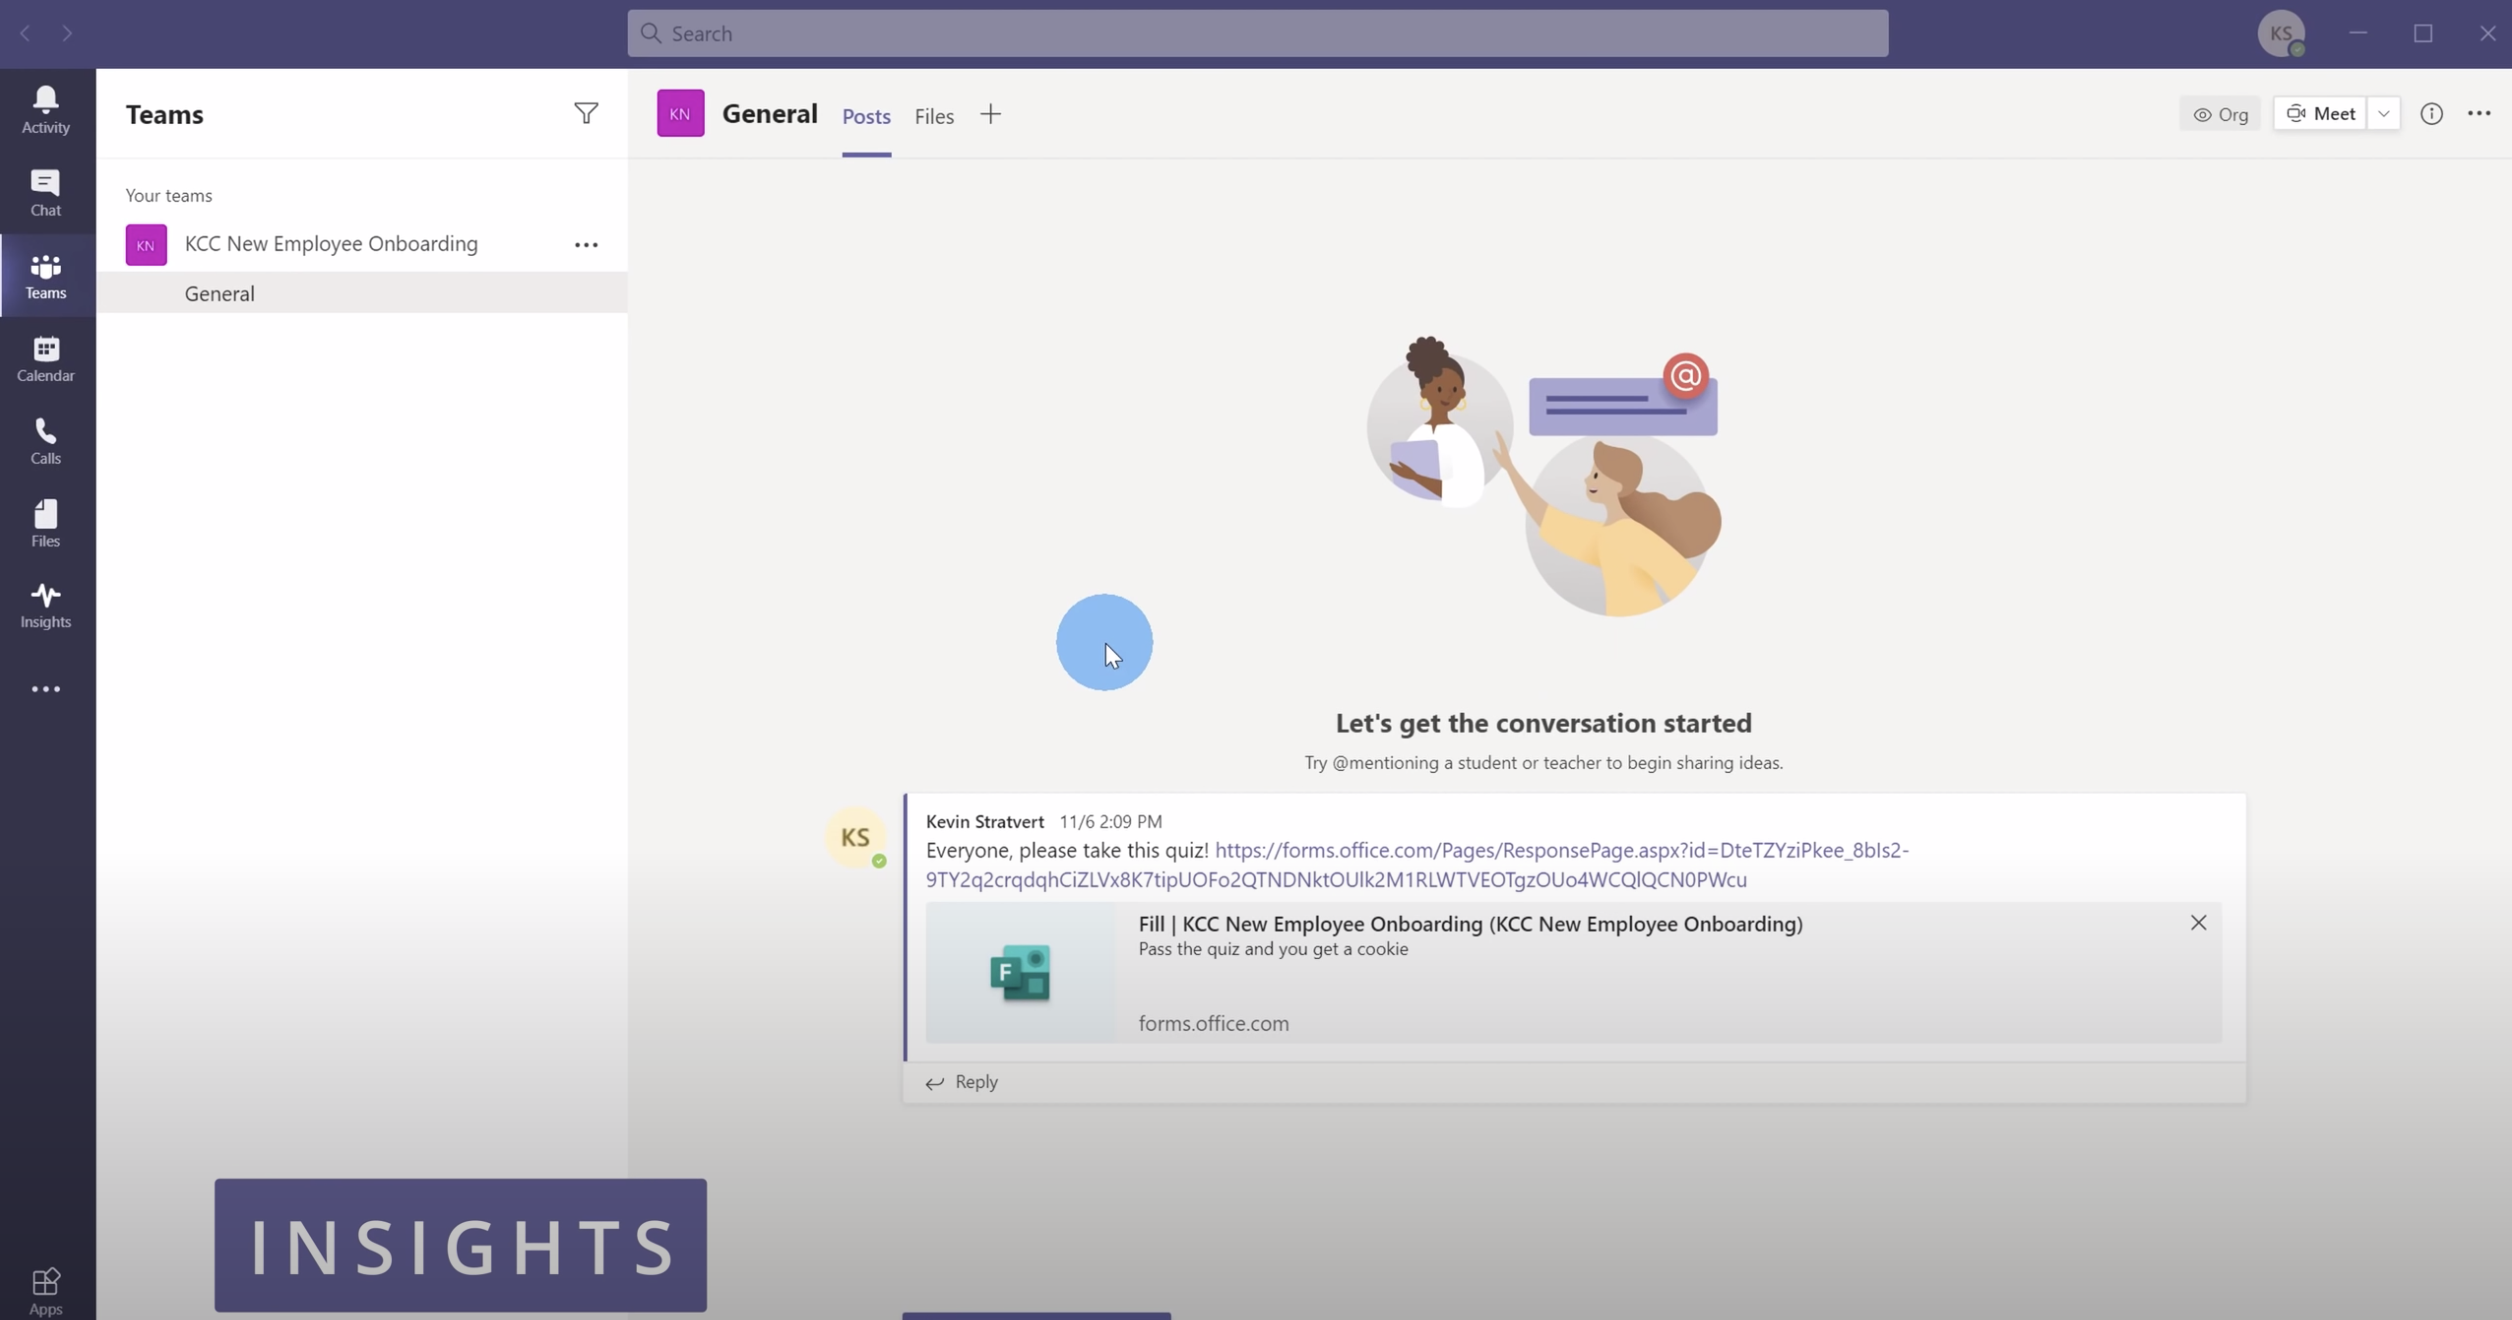 Microsoft Teams insights